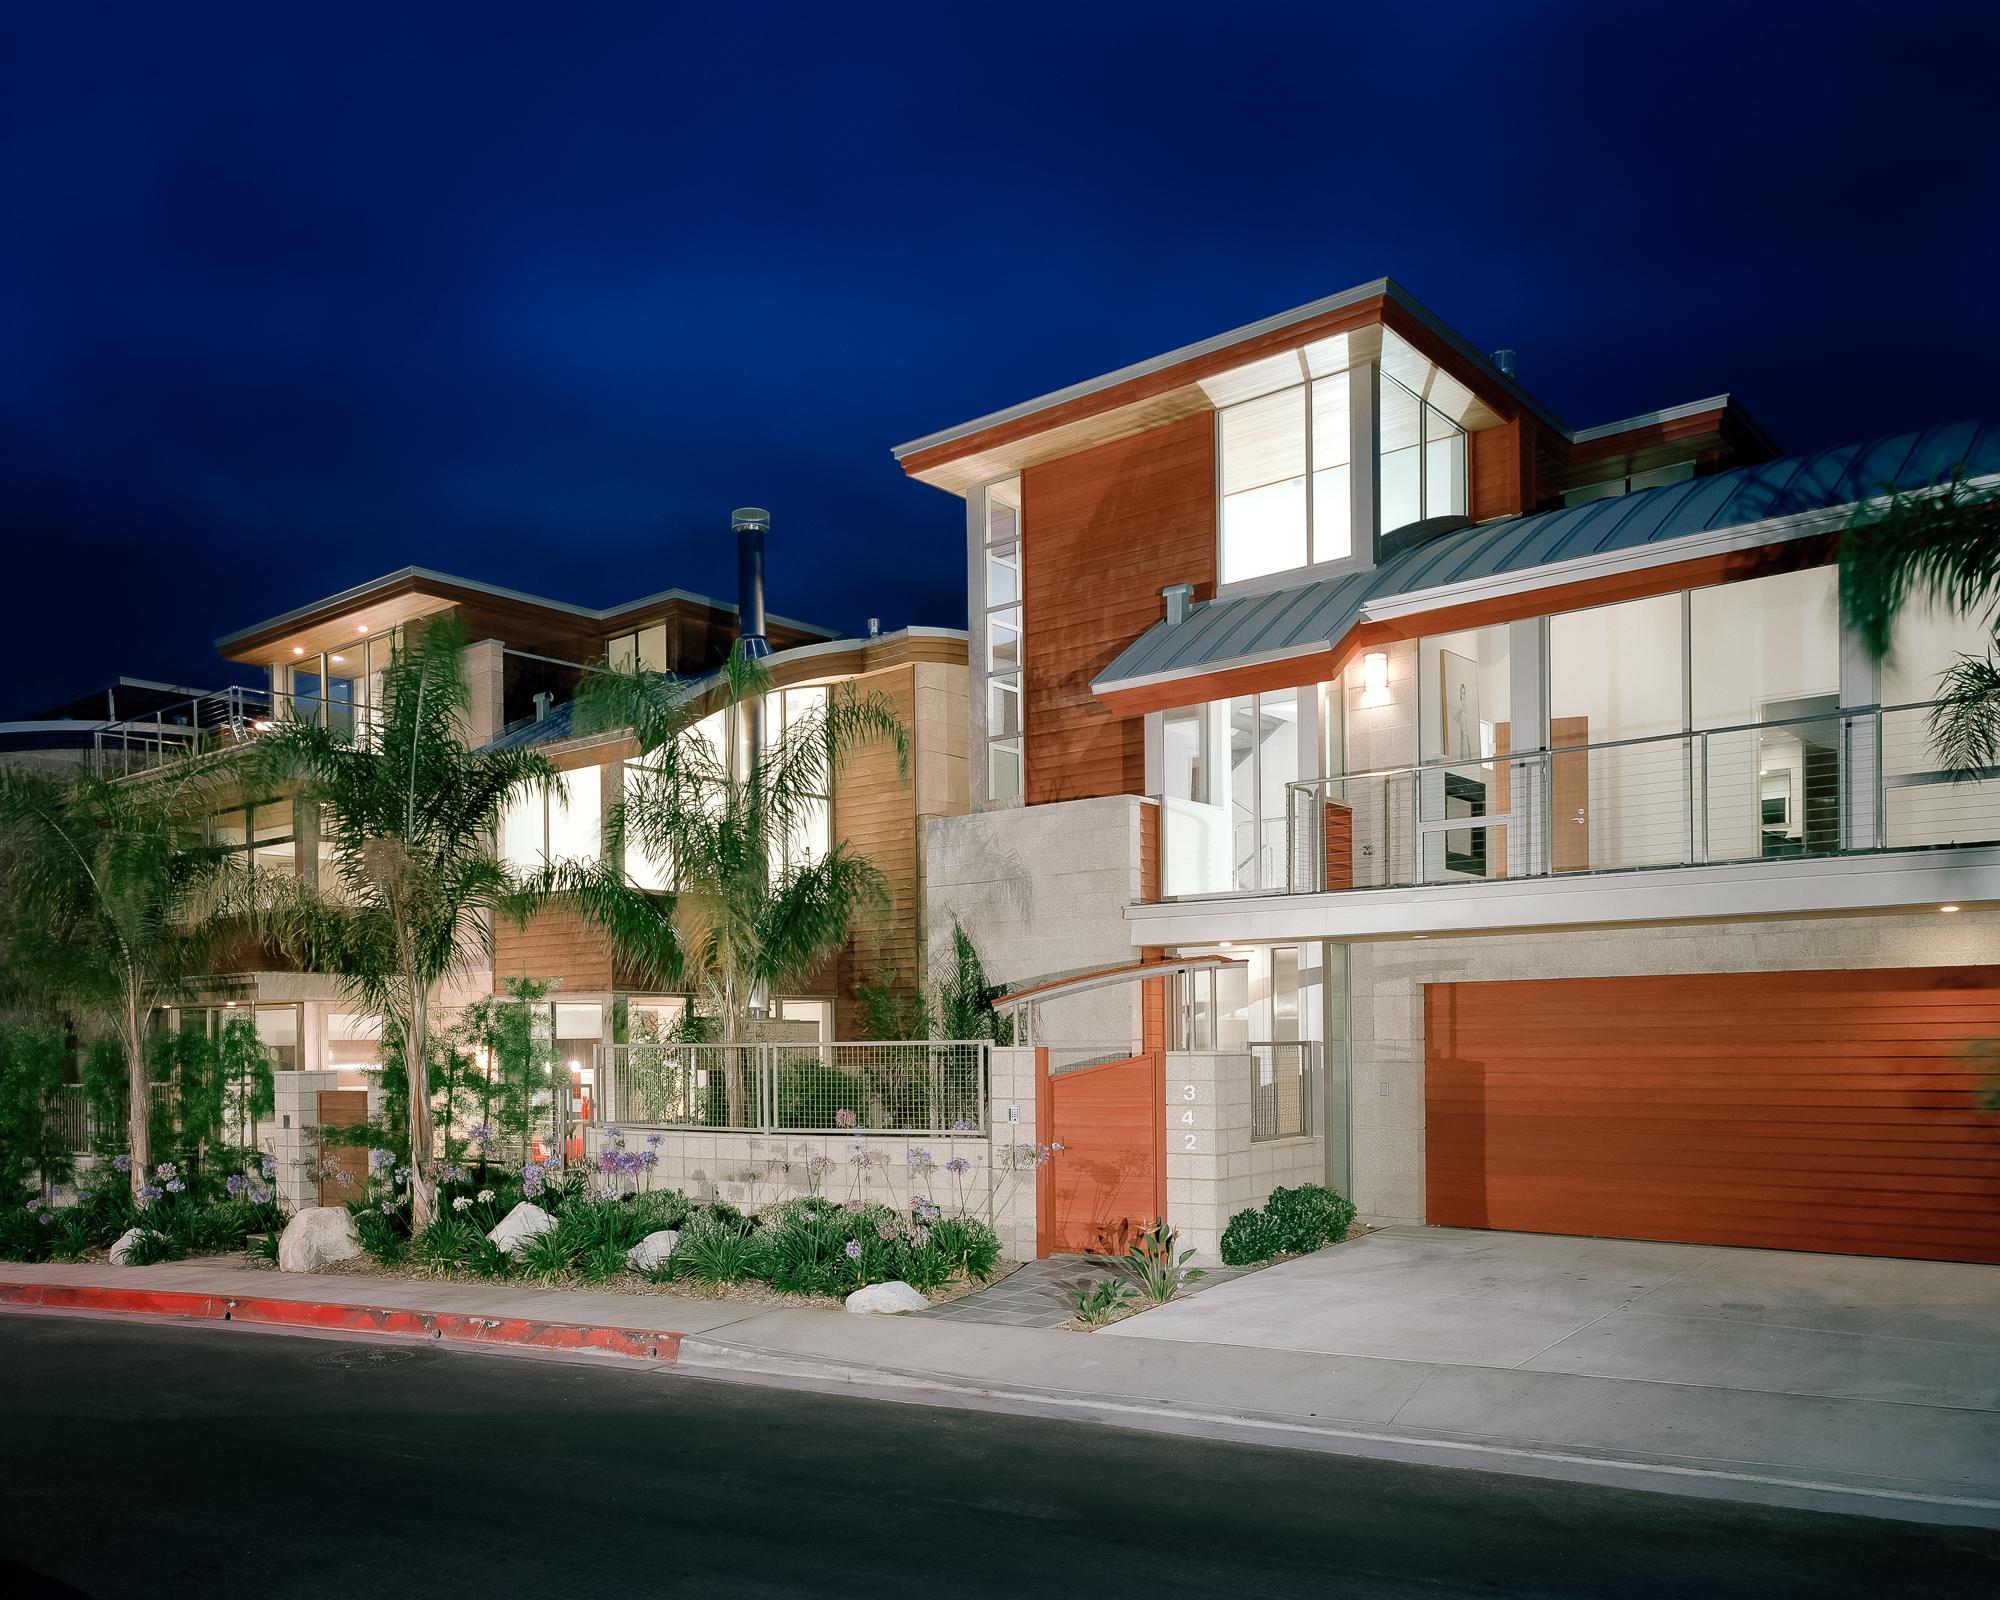 windandsea-residential-project-domusstudio-architecture